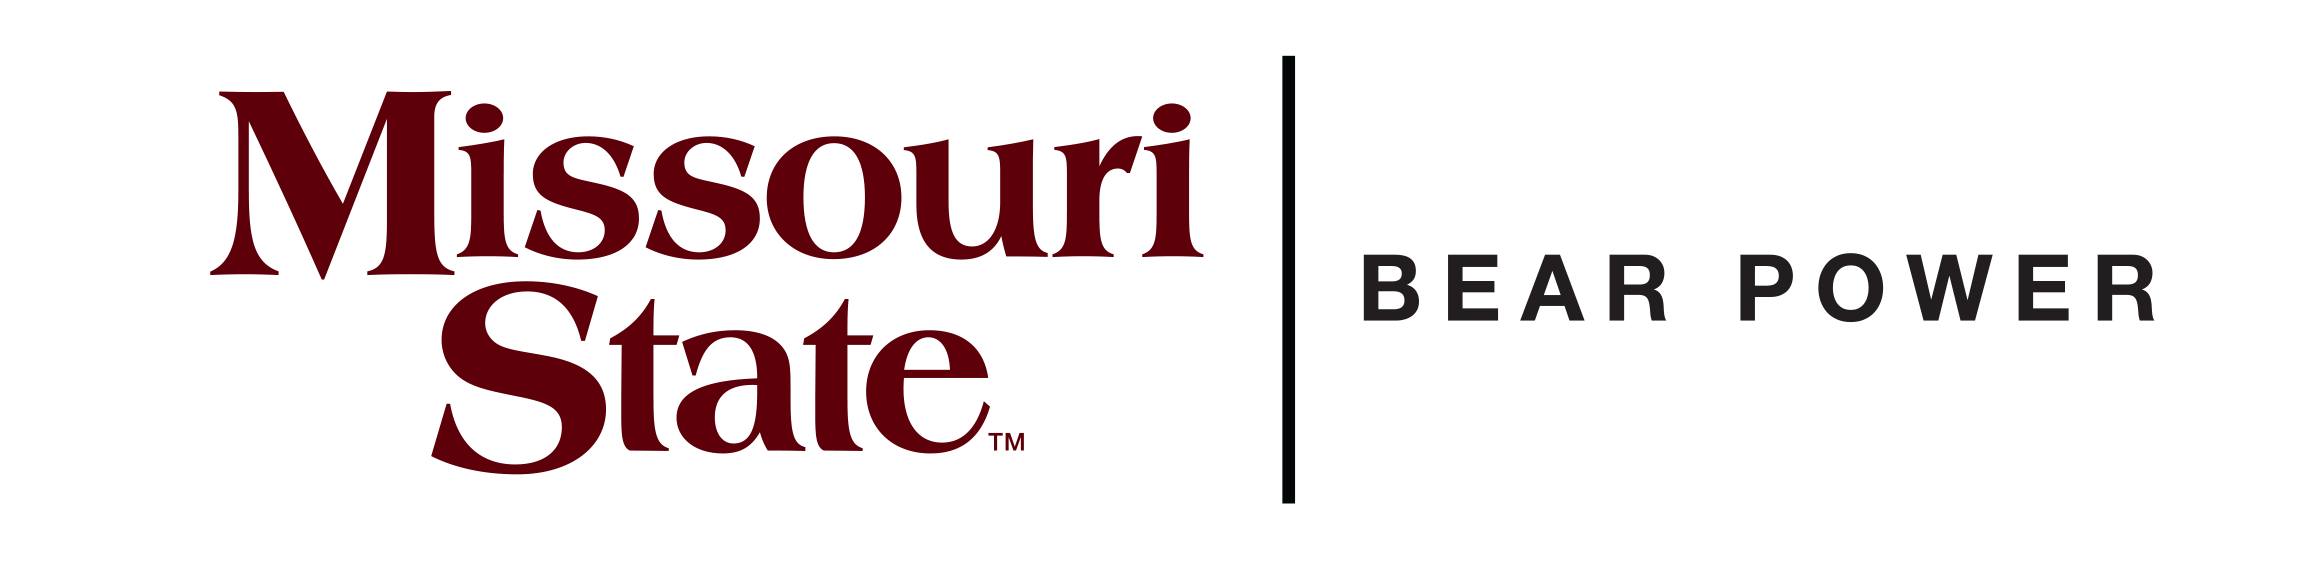 Bear Power logo and link